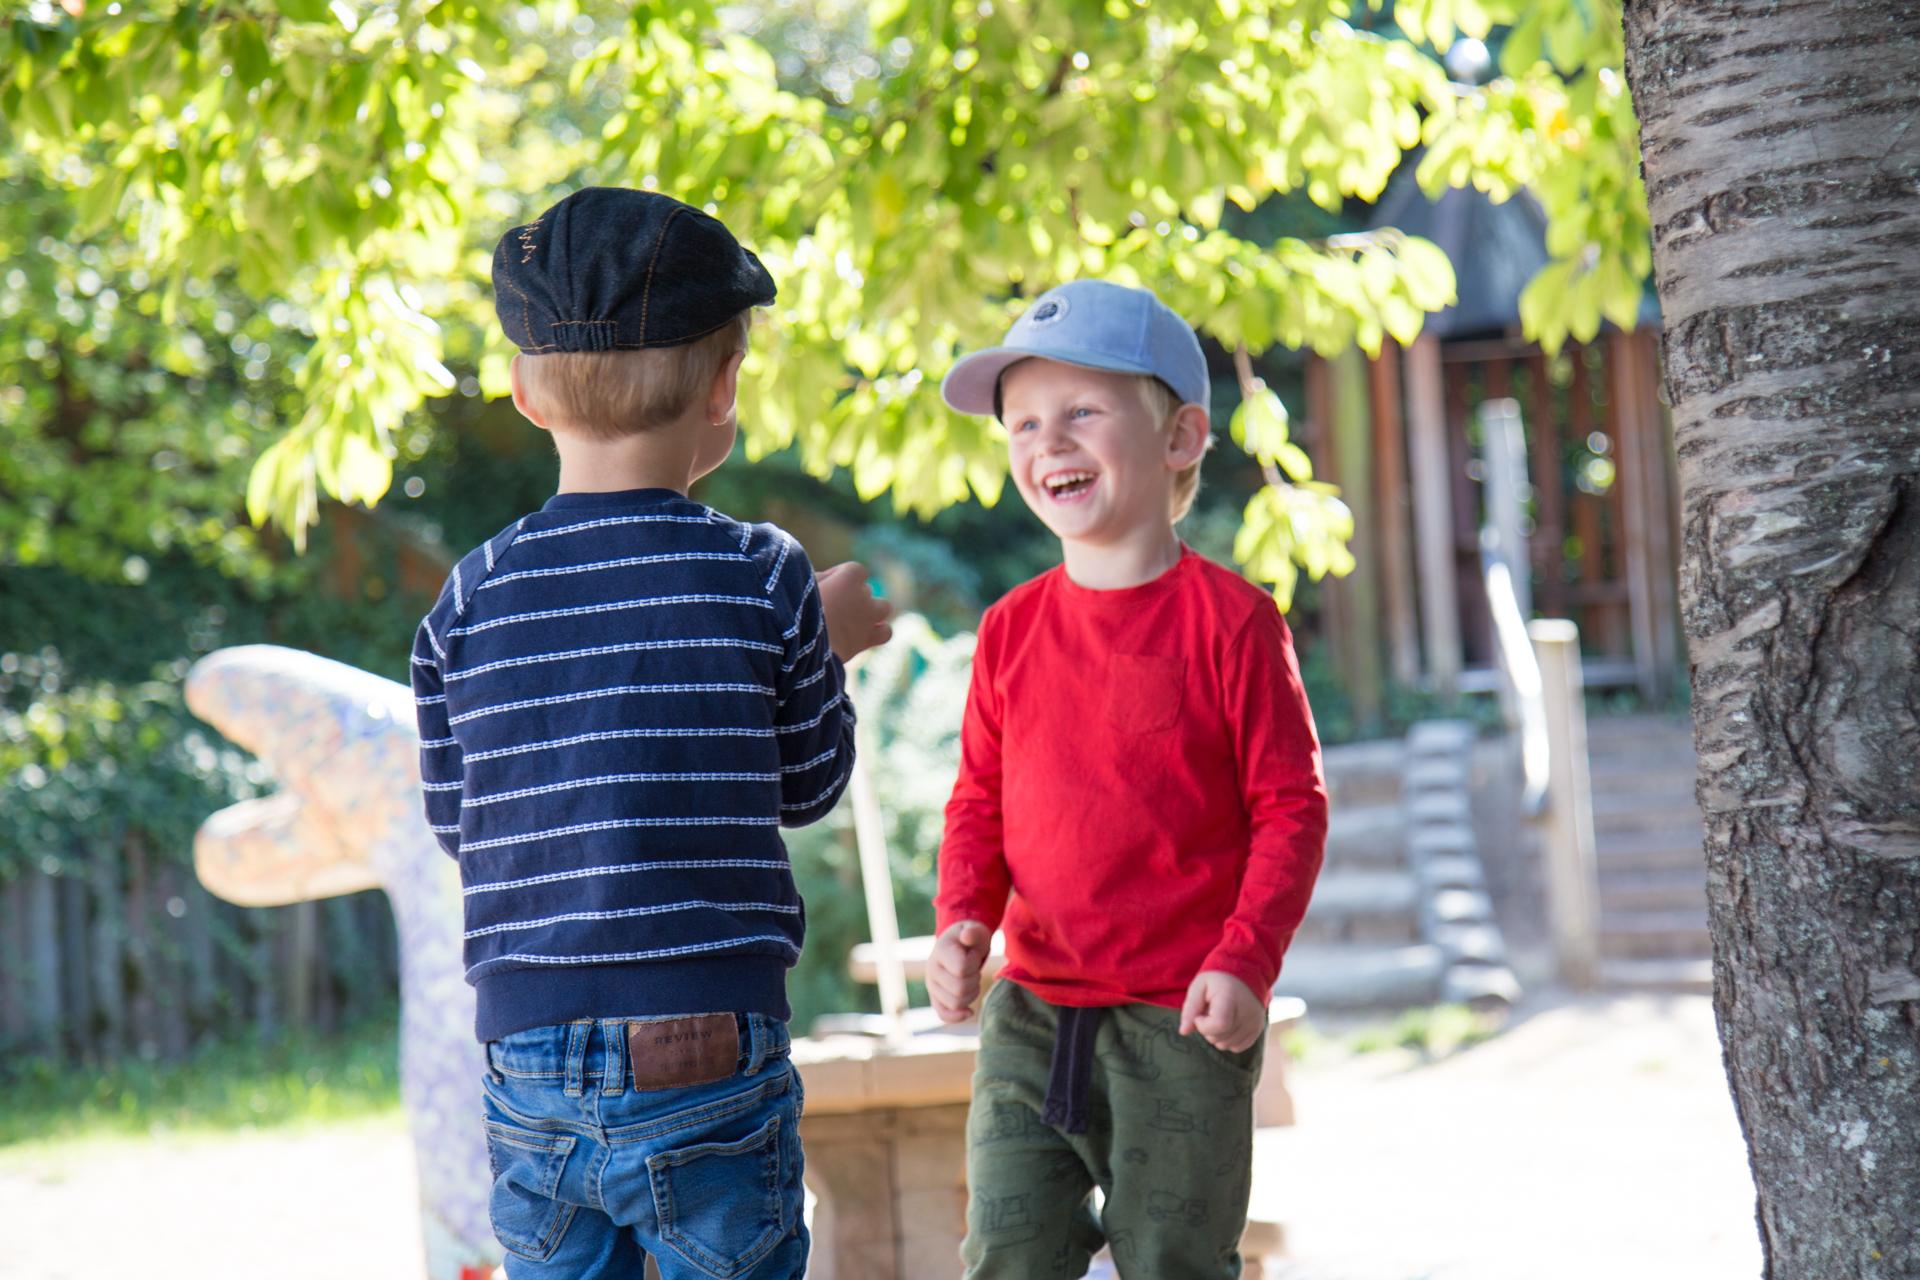 kindergarten-rauenberg - kinder